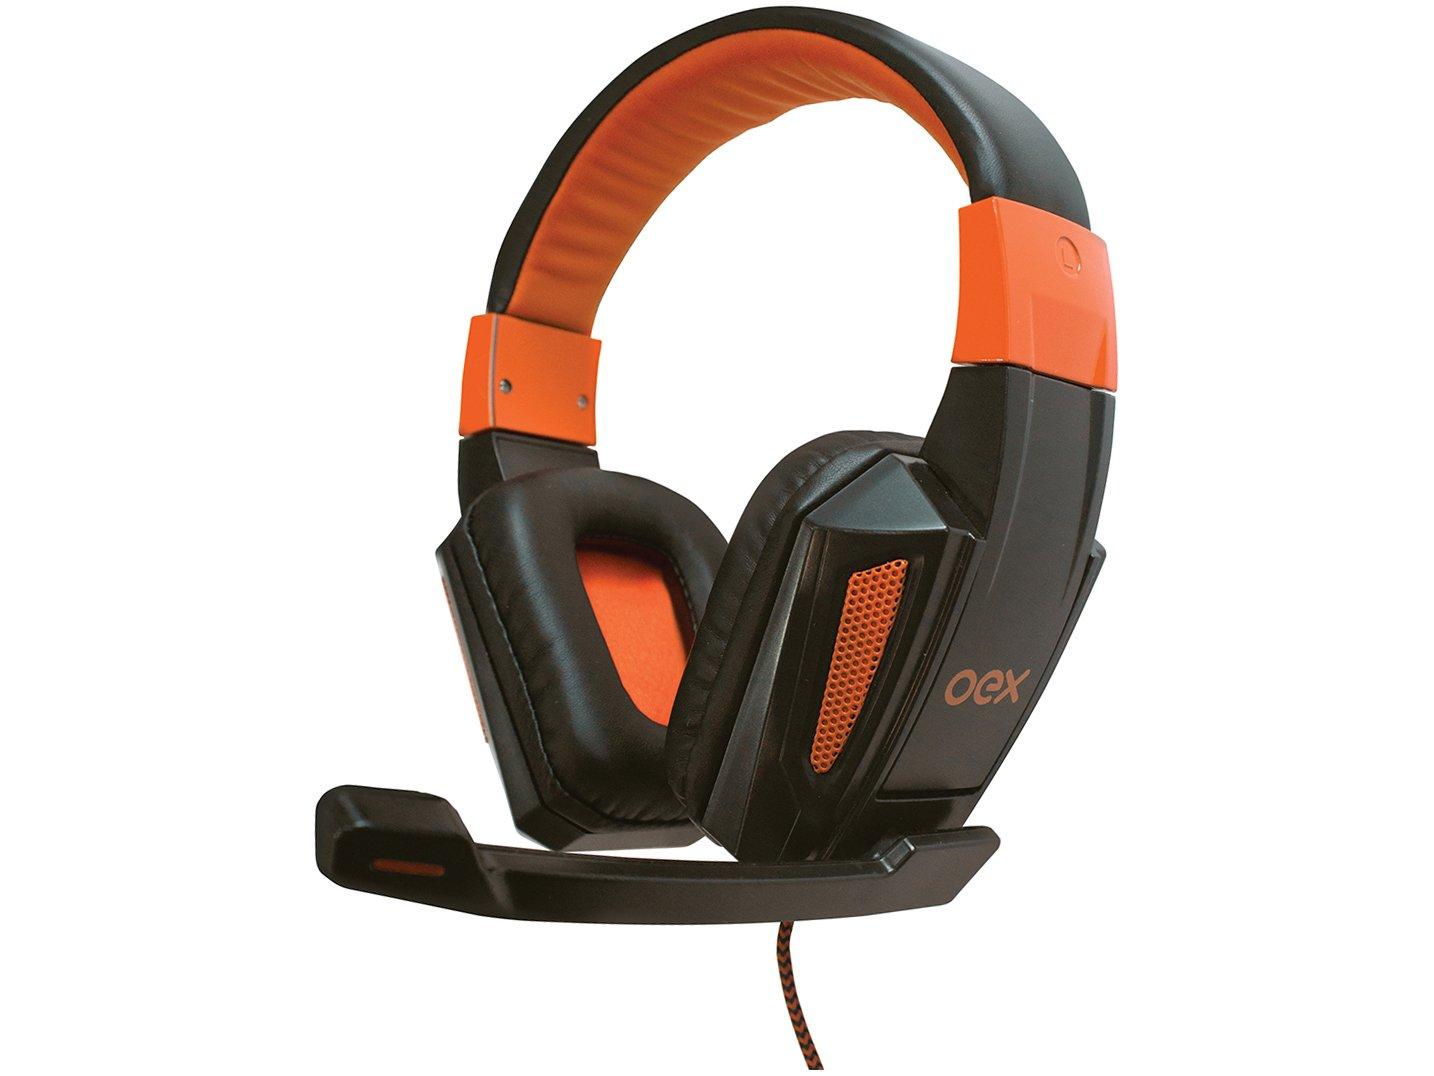 Foto 1 - Headset Gamer para PC OEX - Combat HS205